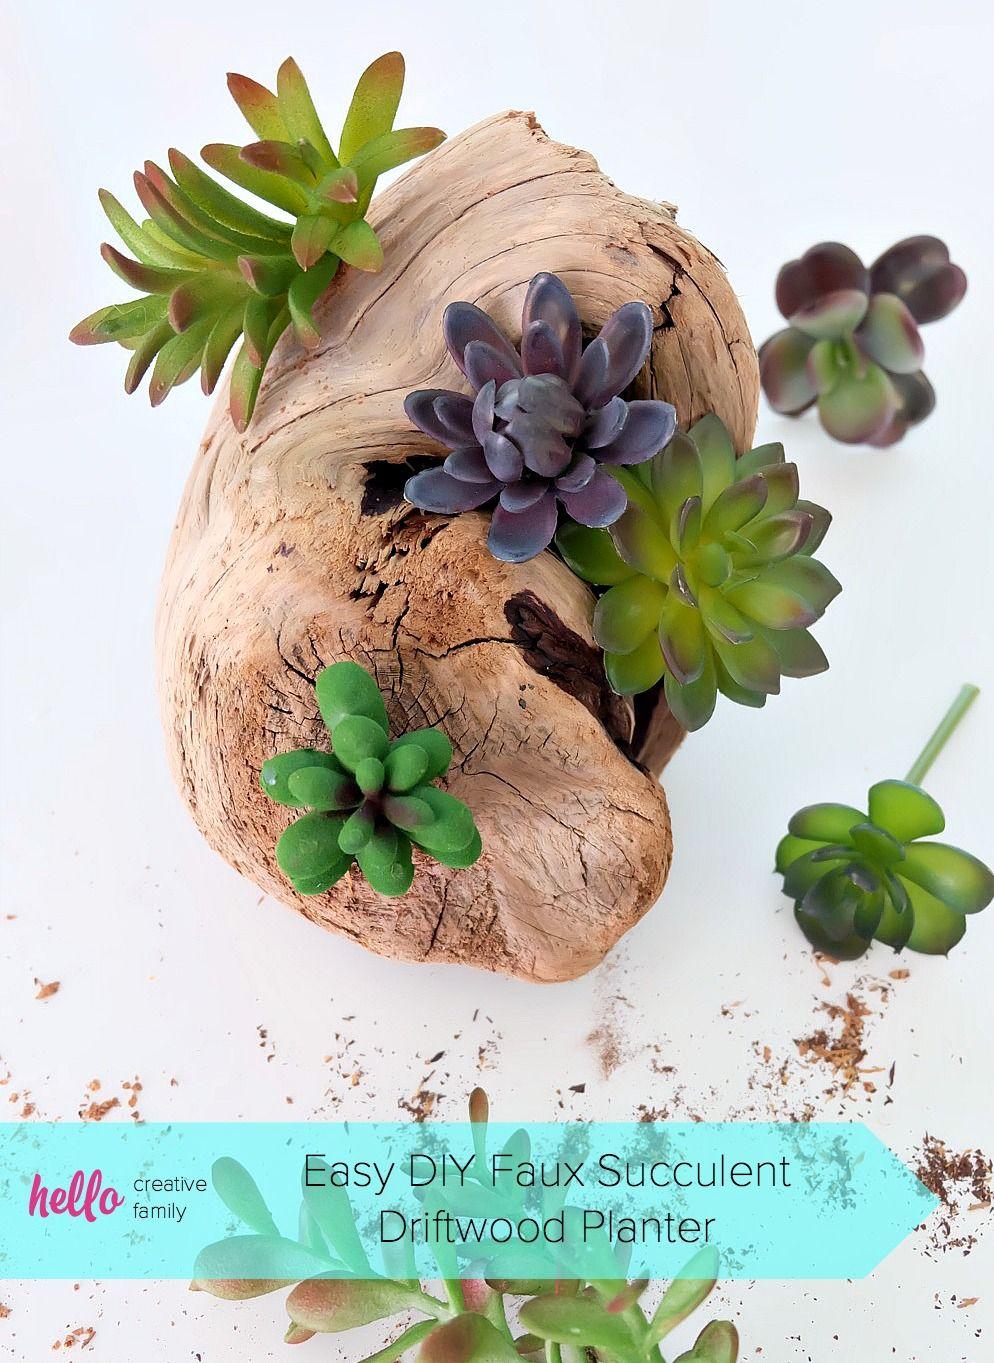 Easy diy faux succulent driftwood planter diy home decor